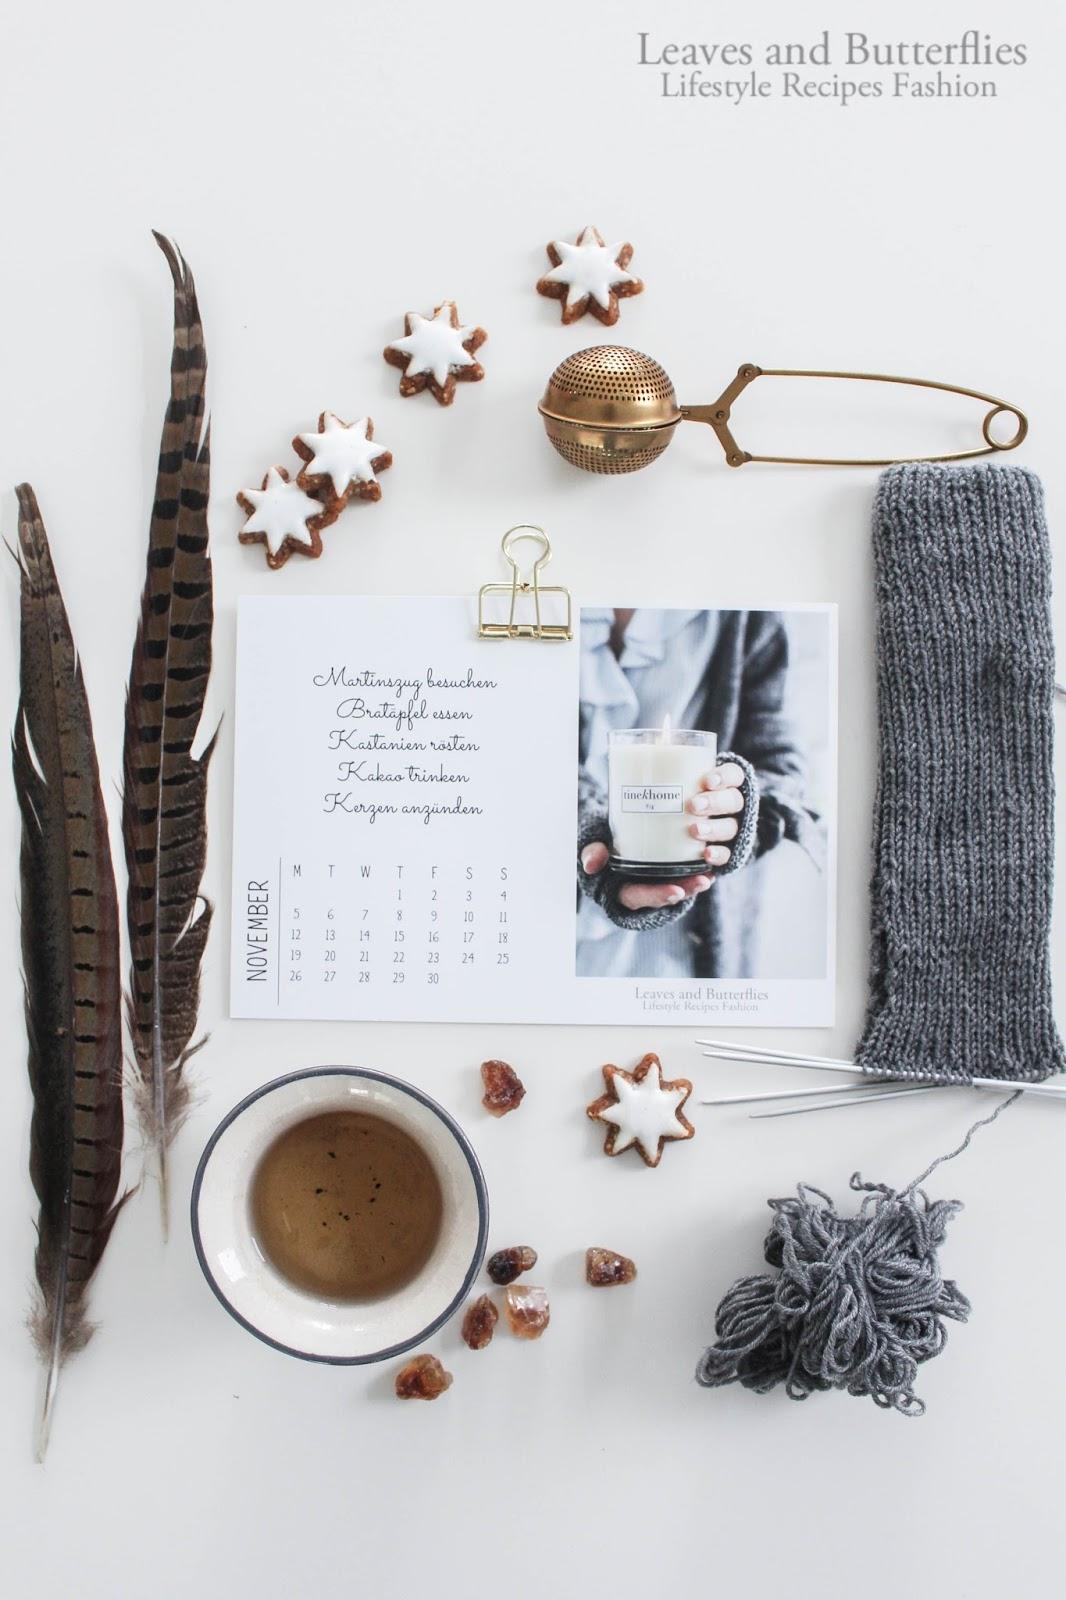 Der Leaves and Butterflies Kalender 2018